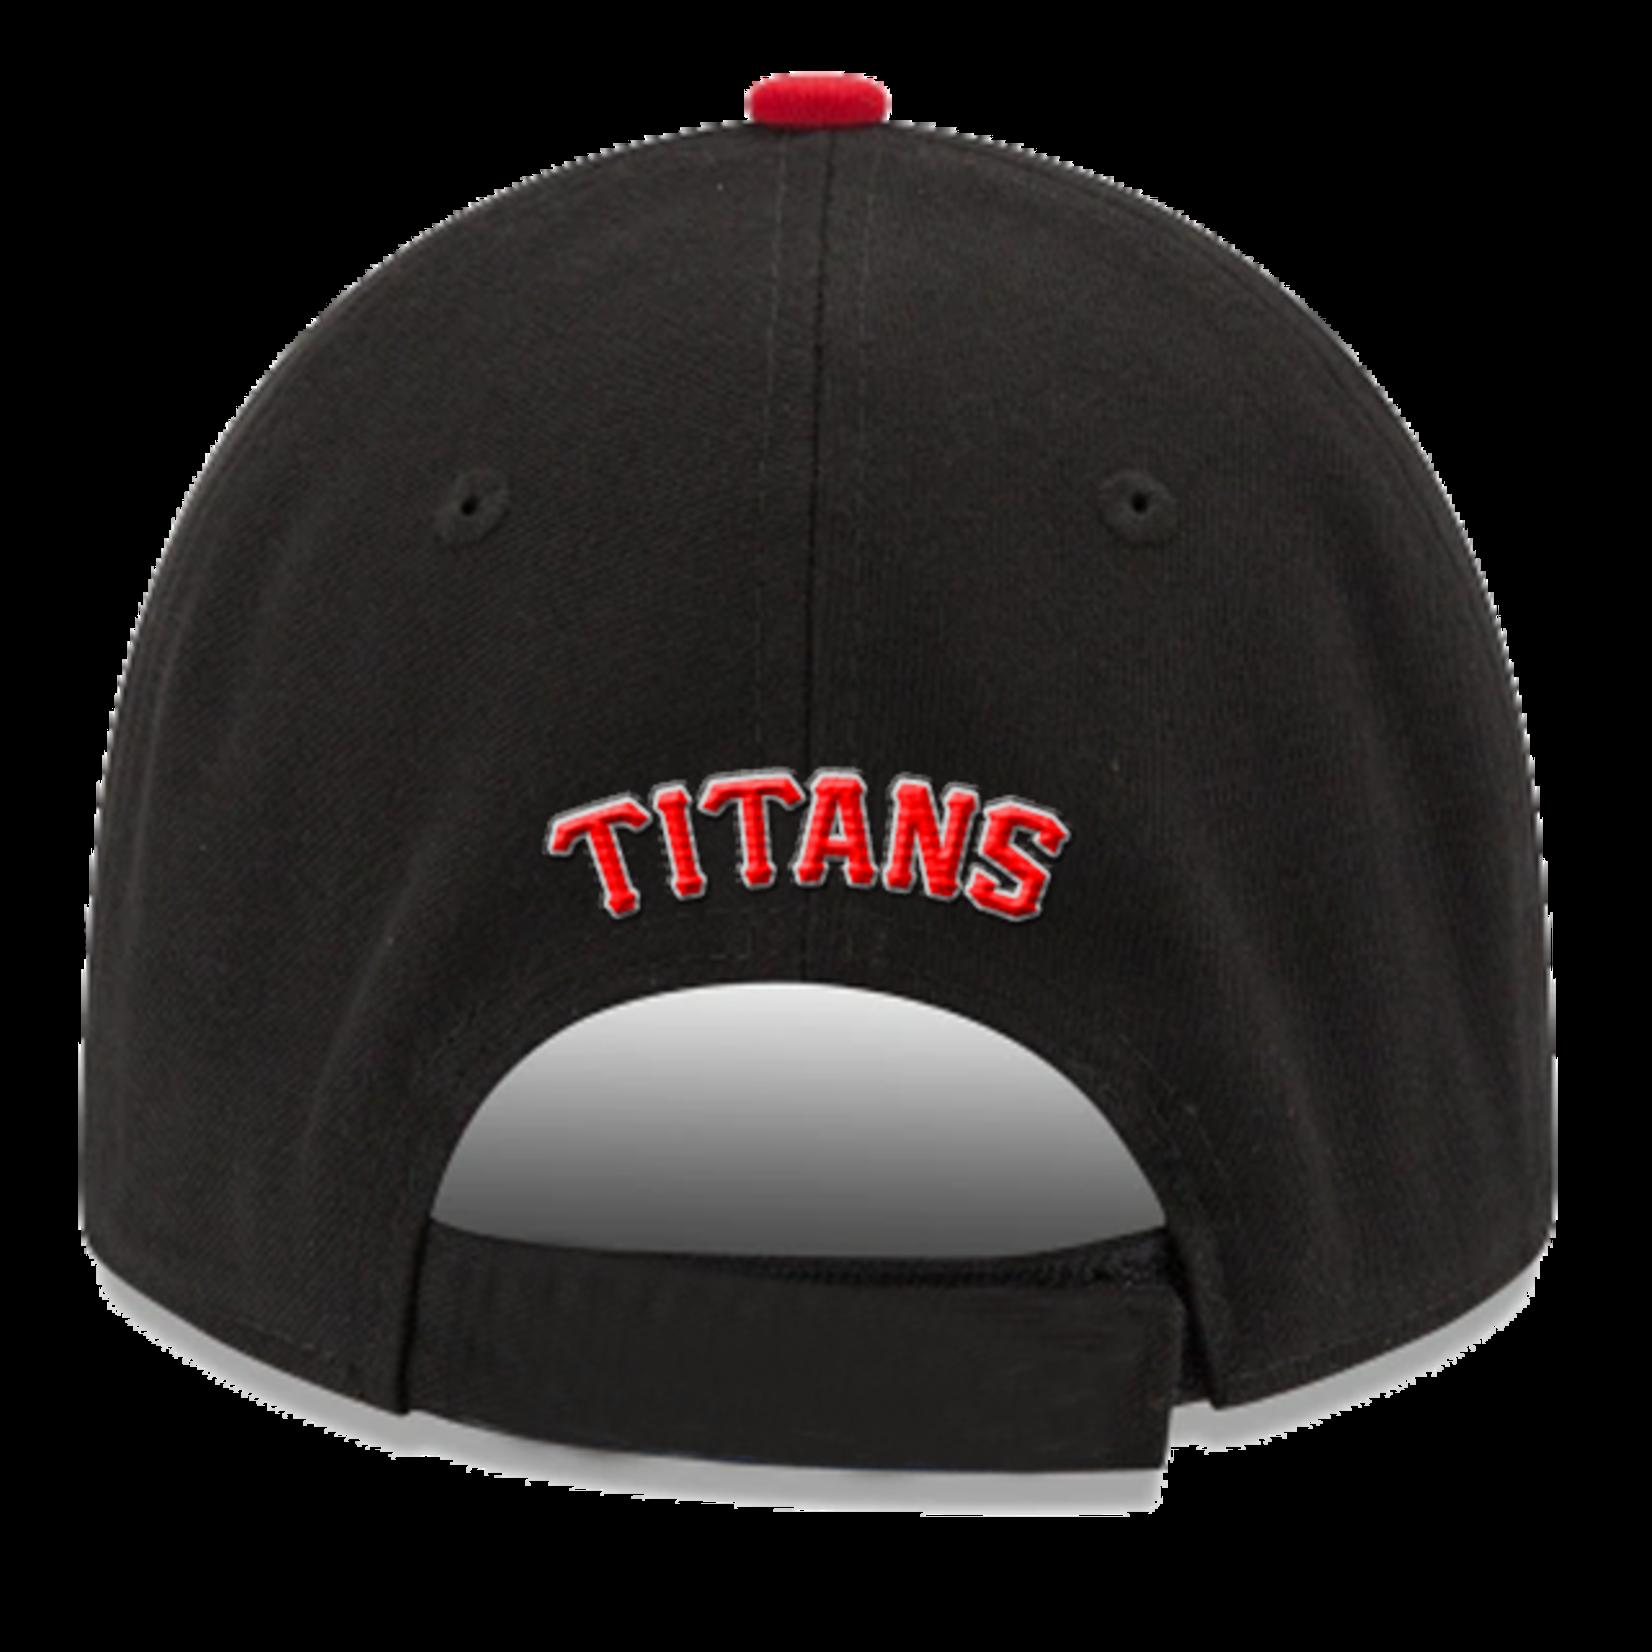 NEW ERA Titans 940 Kids' Black & Red Cap